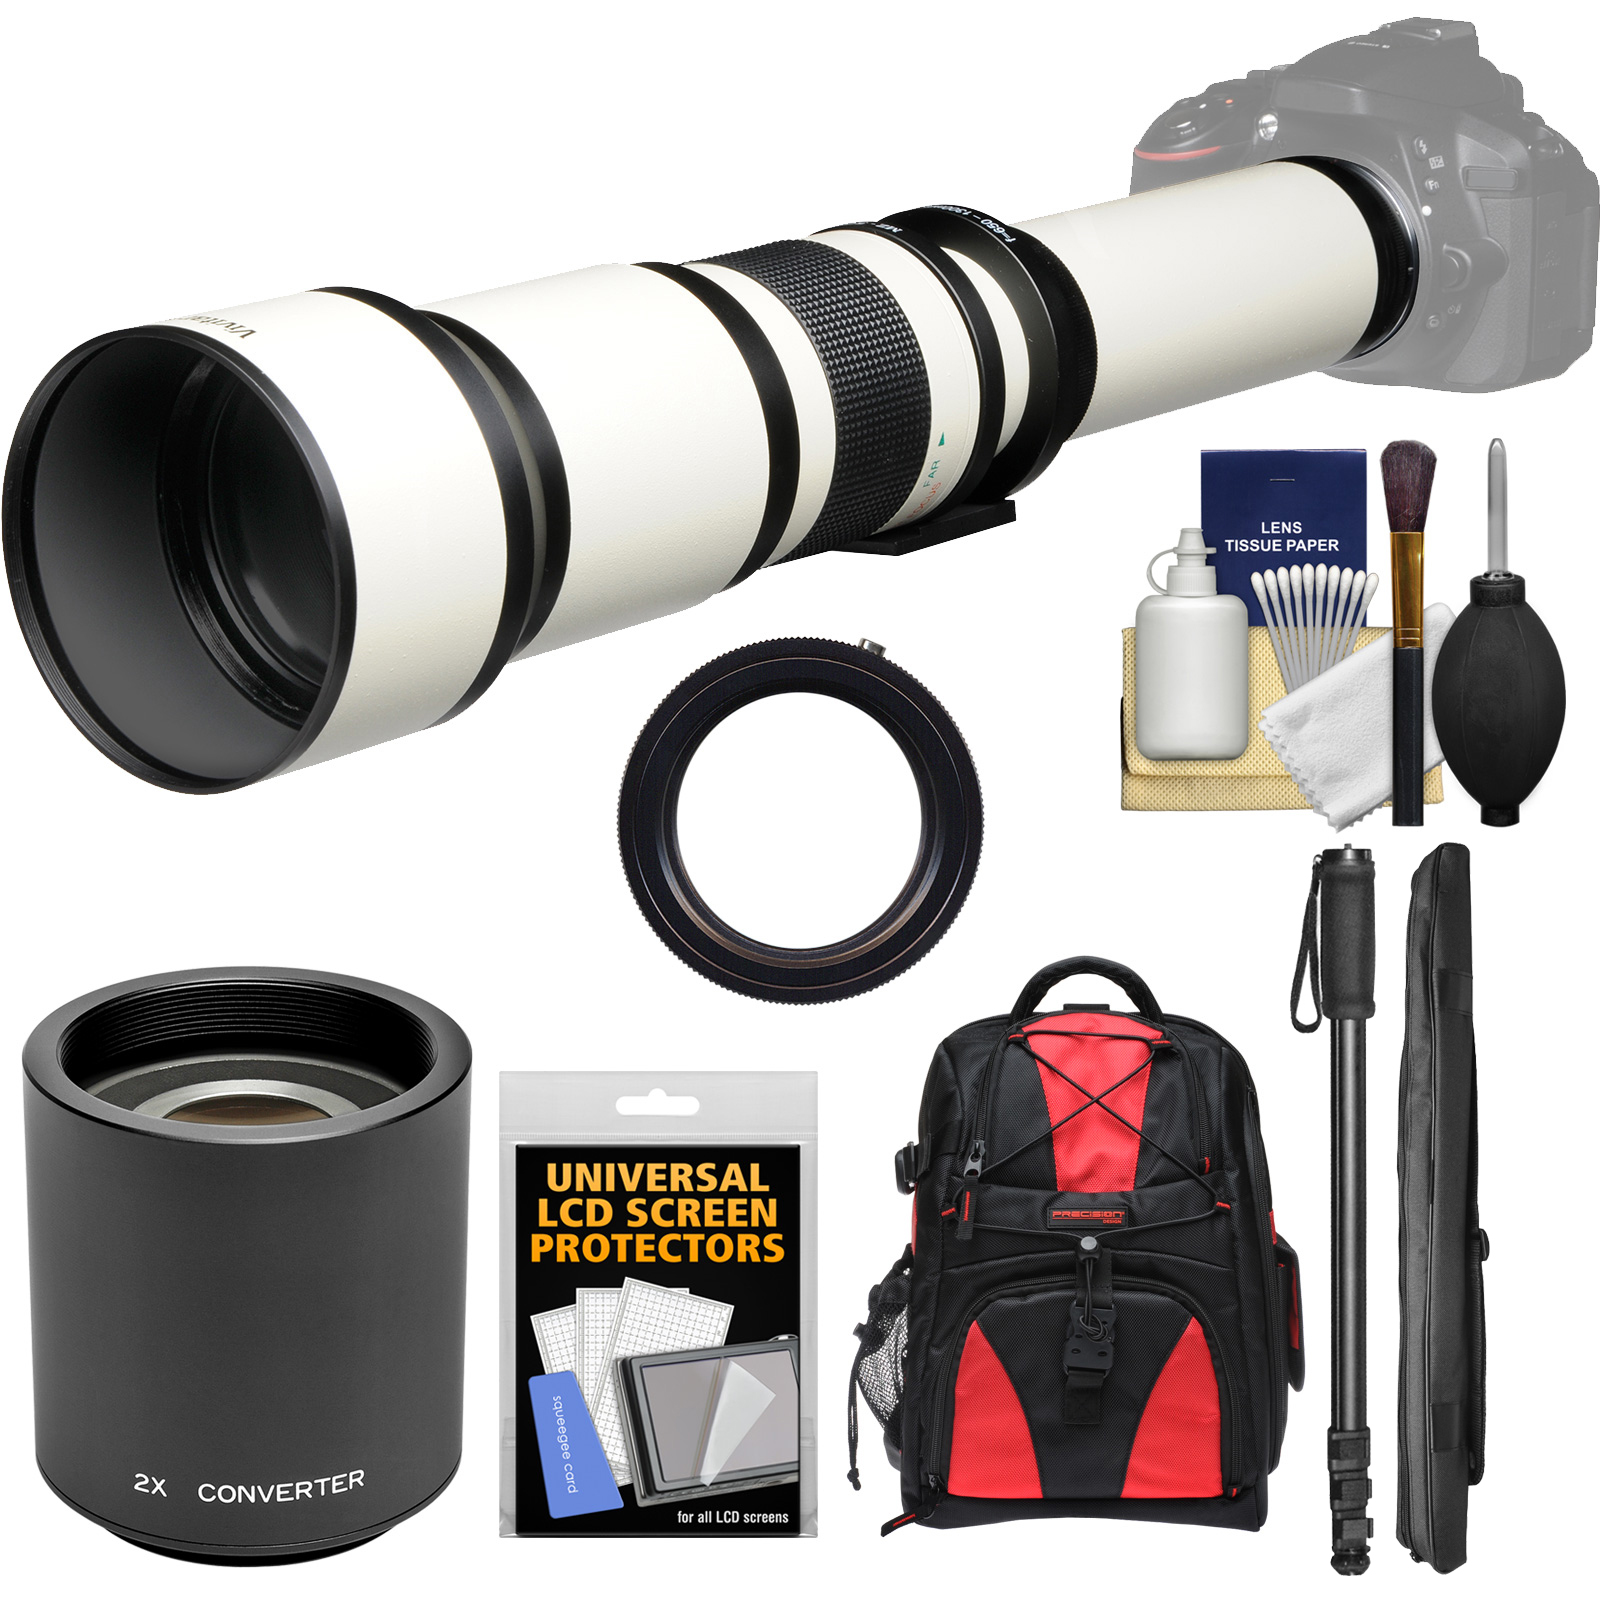 Vivitar 650-1300mm f/8-16 Telephoto Lens (White) (T Mount...